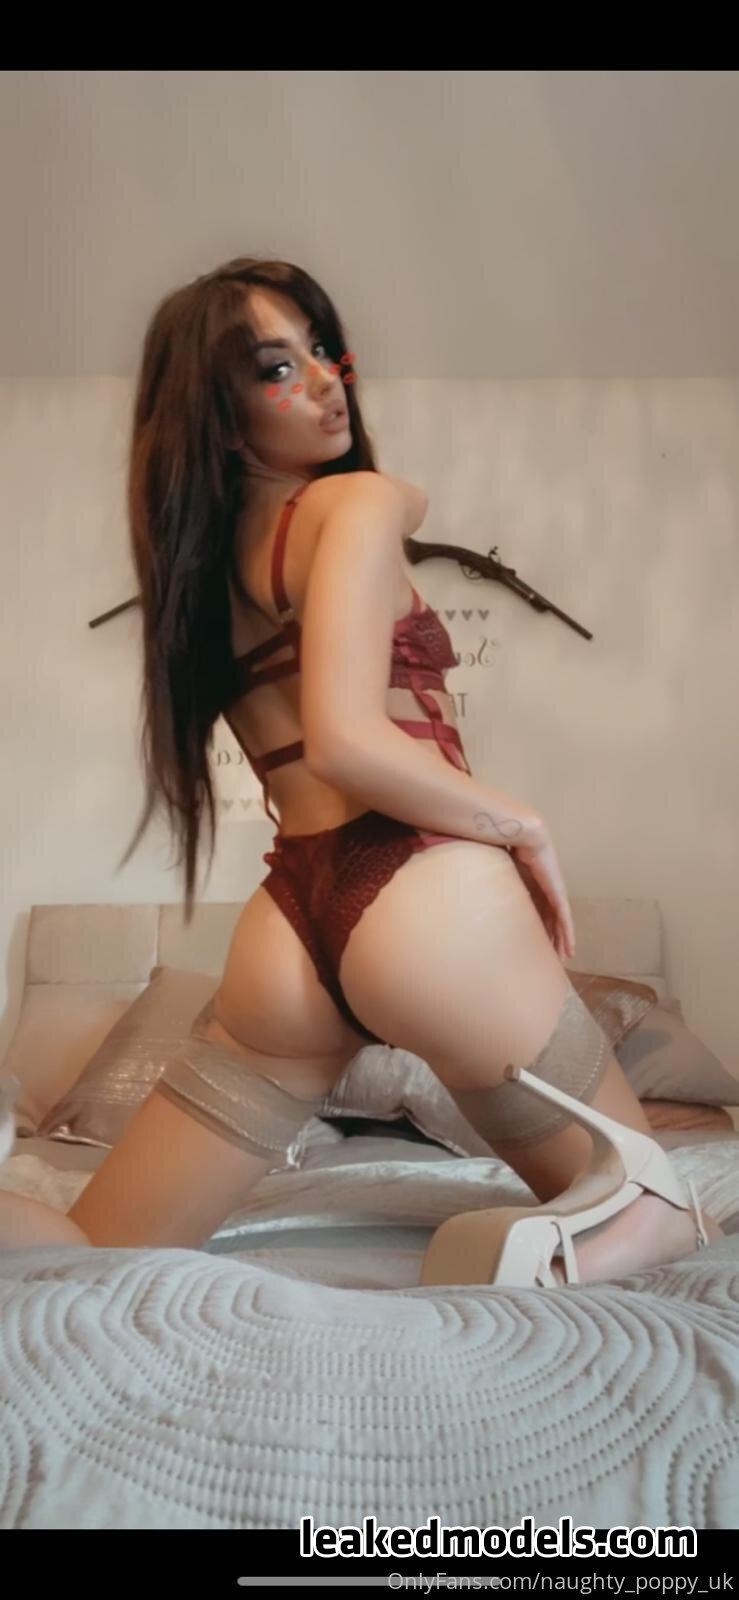 naughty_poppy_uk OnlyFans Nude Leaks (25 Photos)